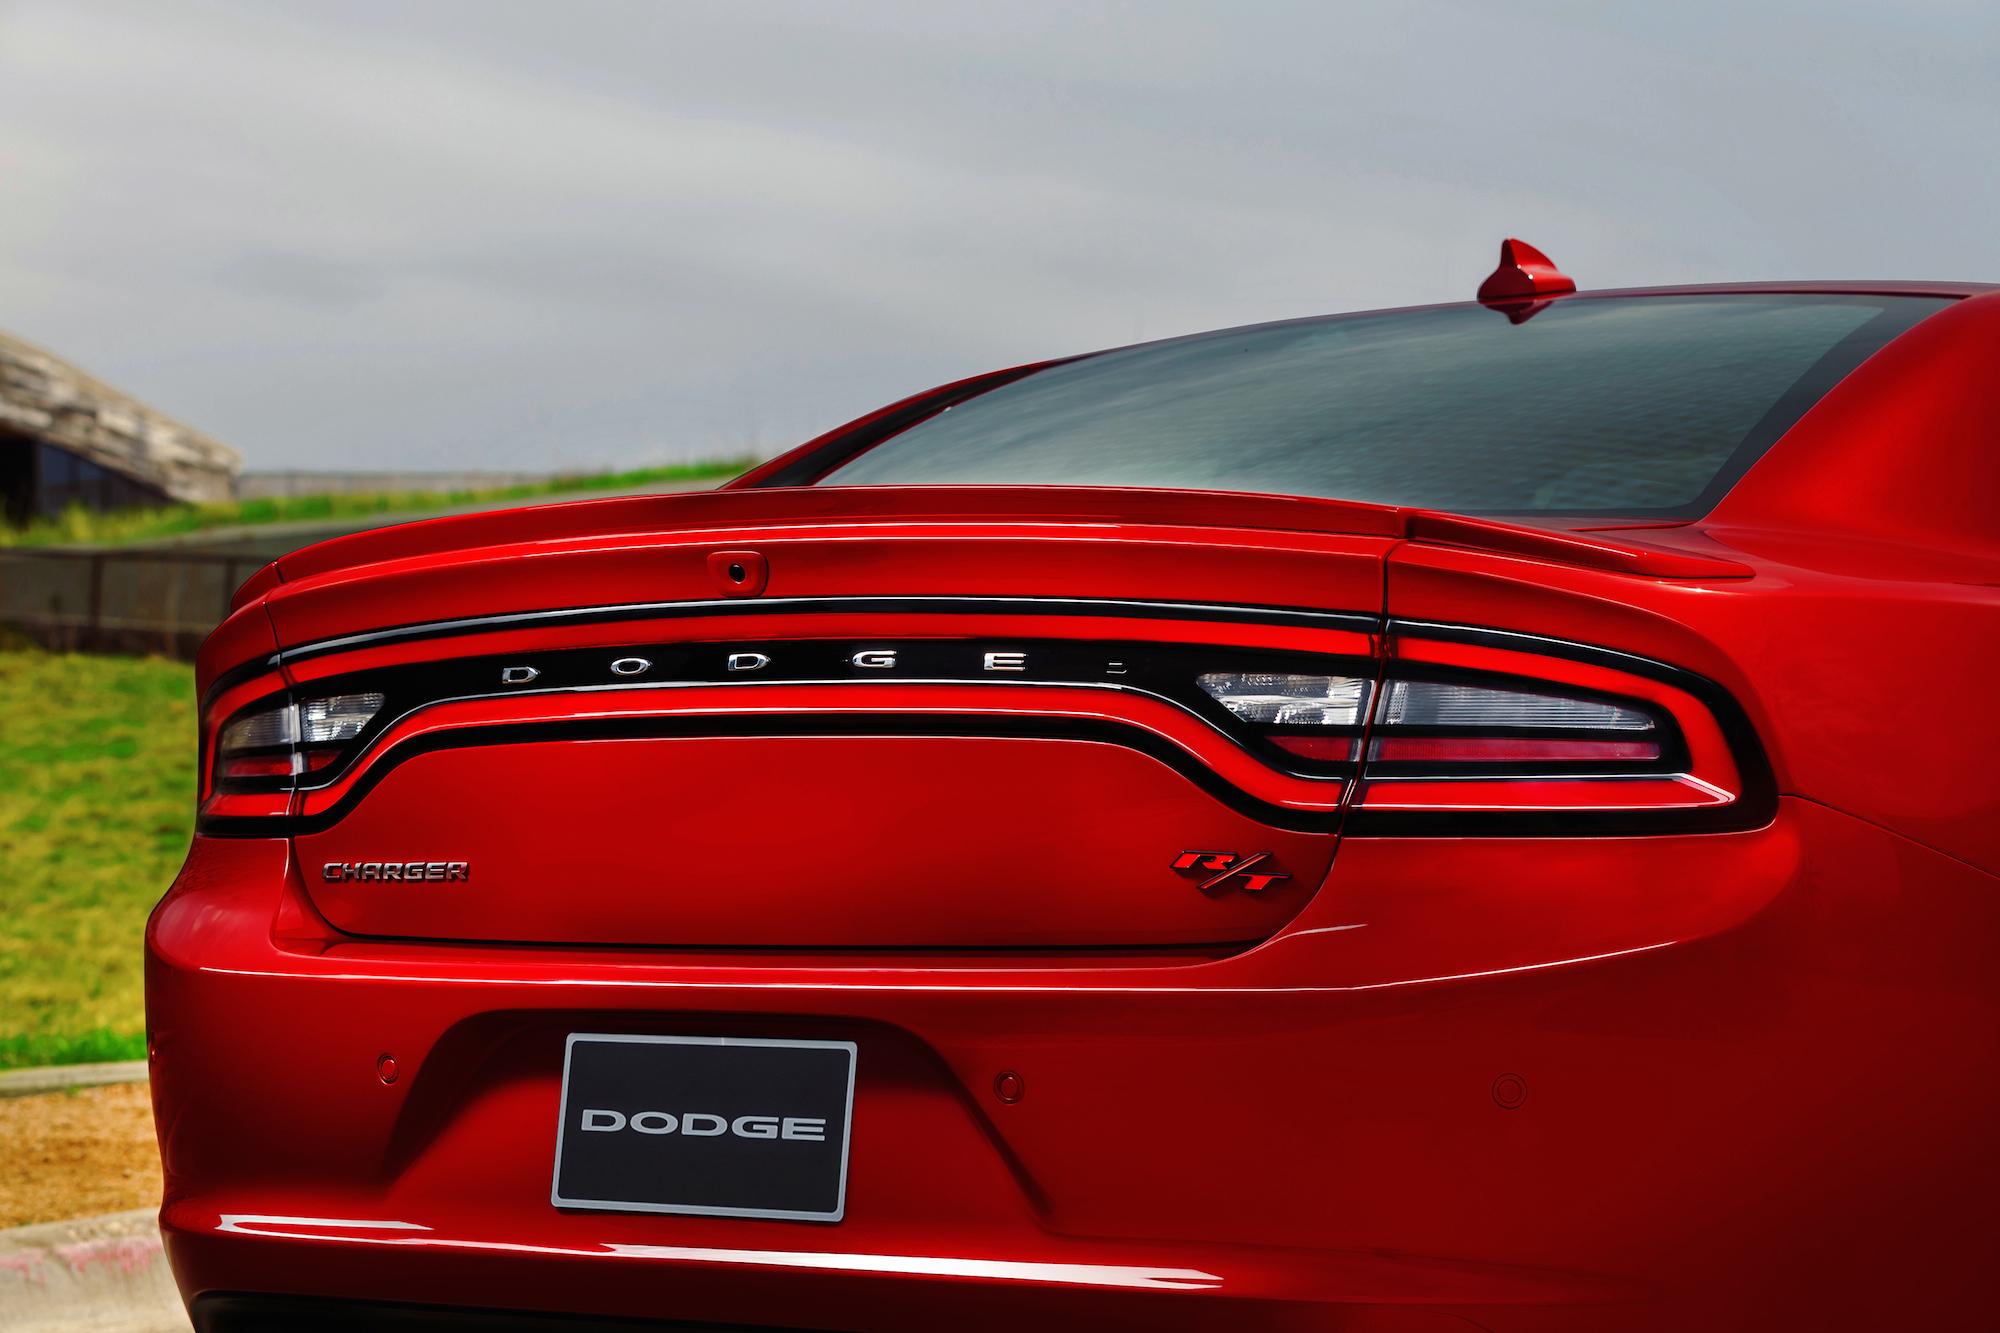 Dodge Barracuda 2015 >> Dodge Barracuda Confirmed Next Gen Charger Detailed